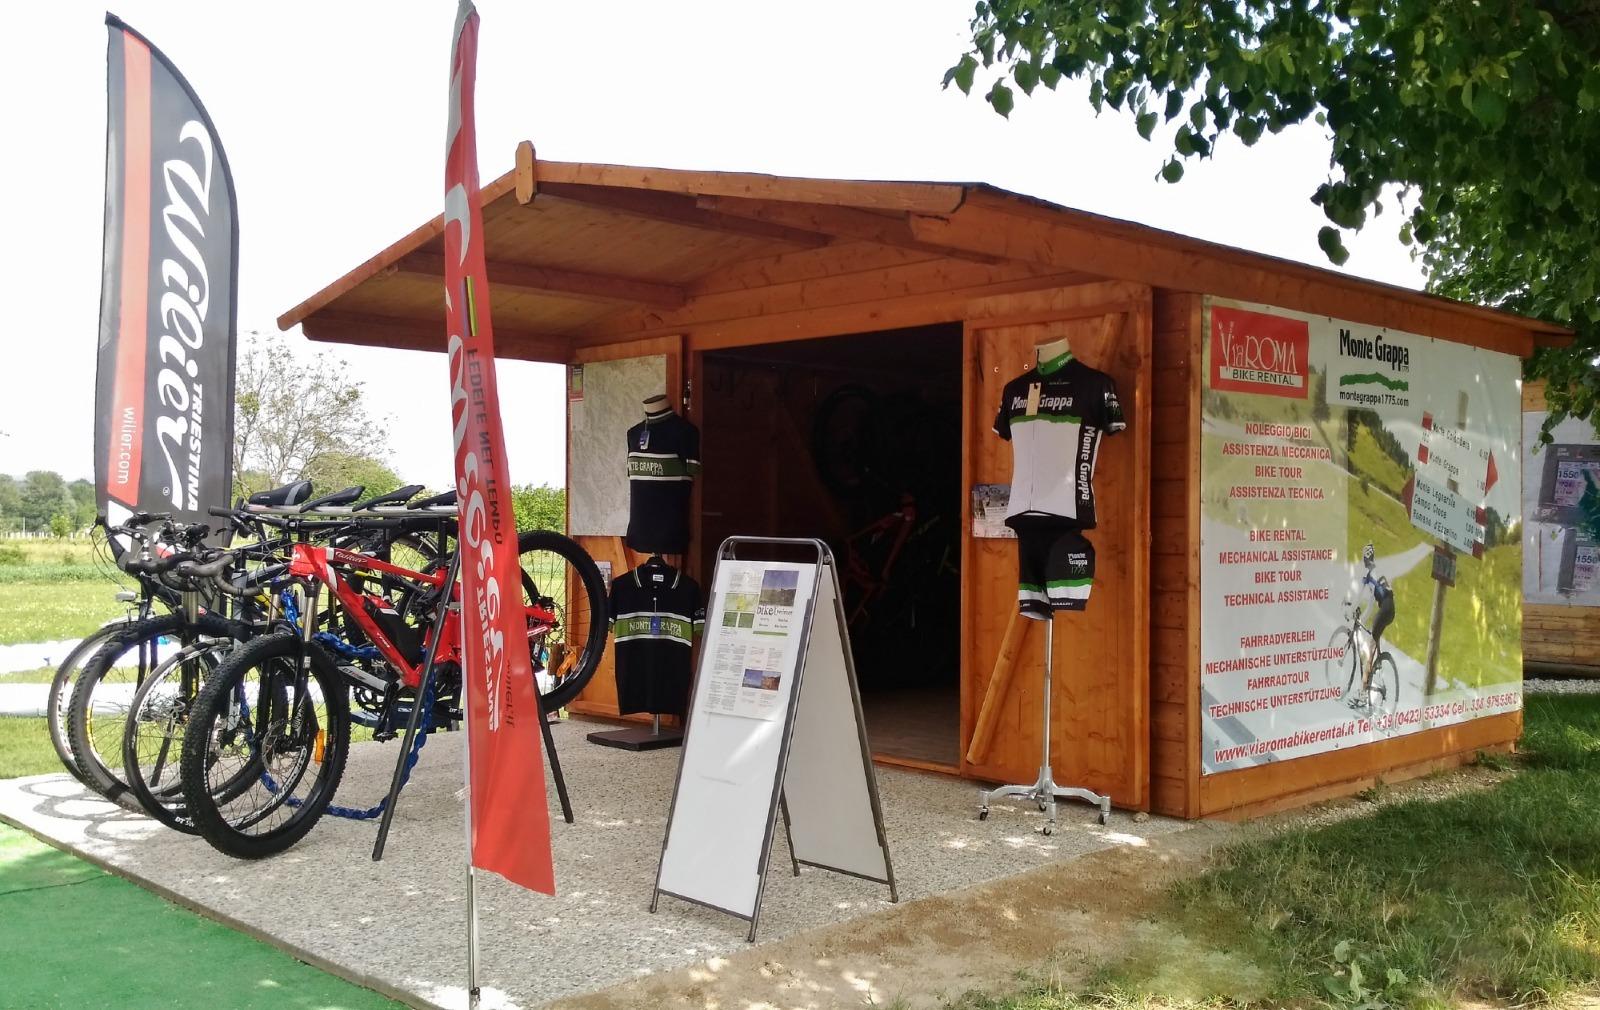 ROAD BIKE GTR WILIER - Noleggio bici Treviso